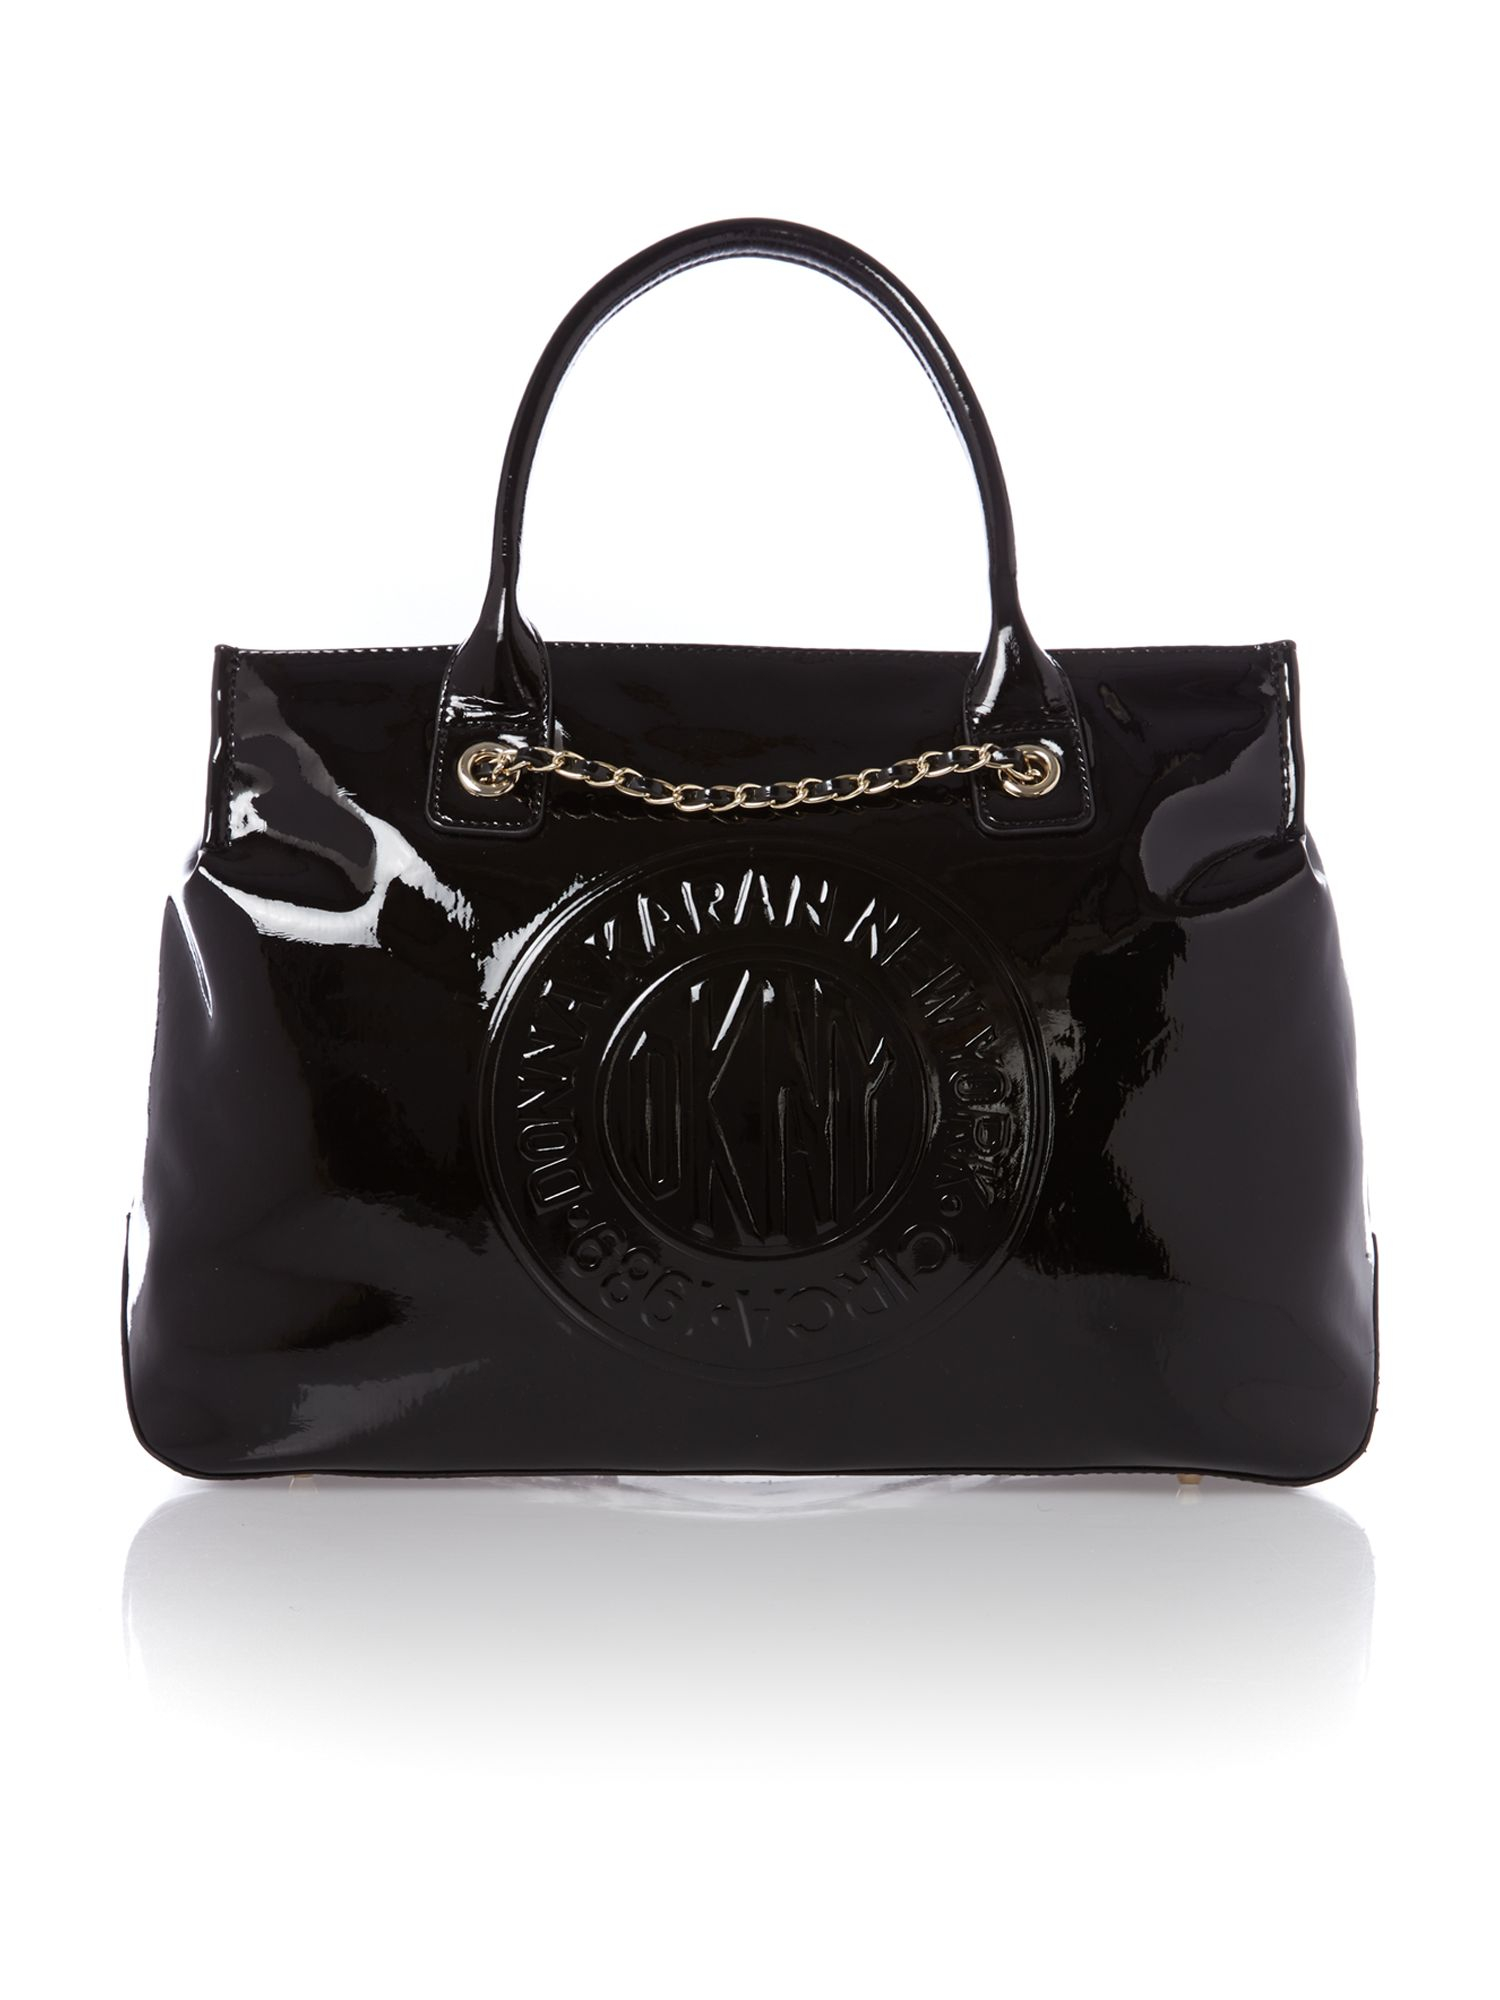 dkny patent black tote bag in black lyst